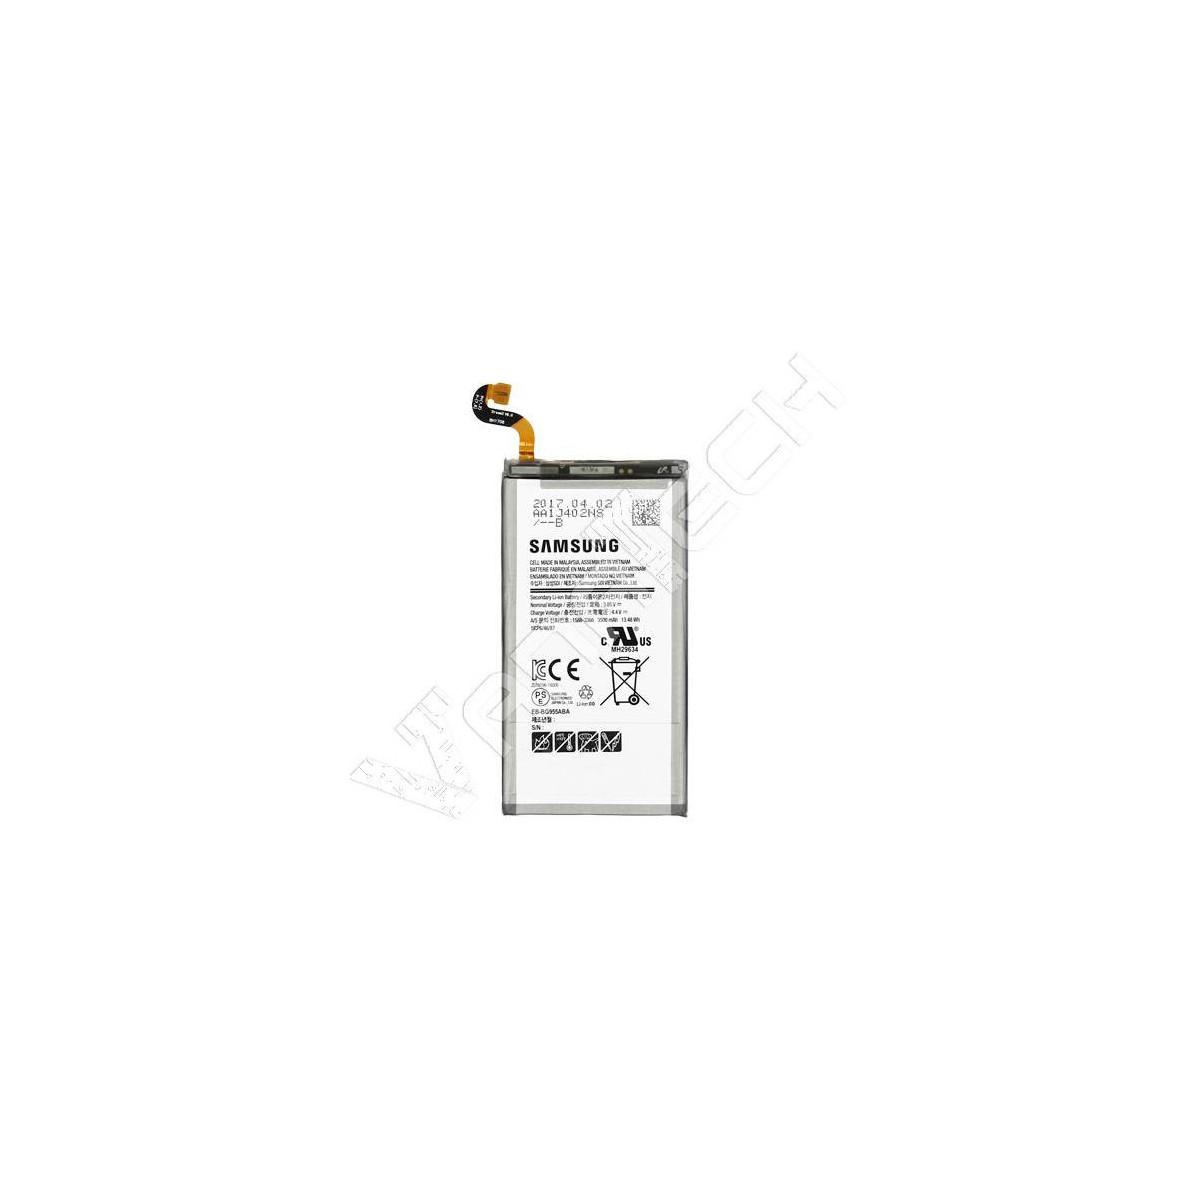 SCHEDA VIDEO NVIDIA GIGABYTE GT730 2GB DDR3 HDMI/DVI-D/VGA GDDR5 GV-N730D5-2I